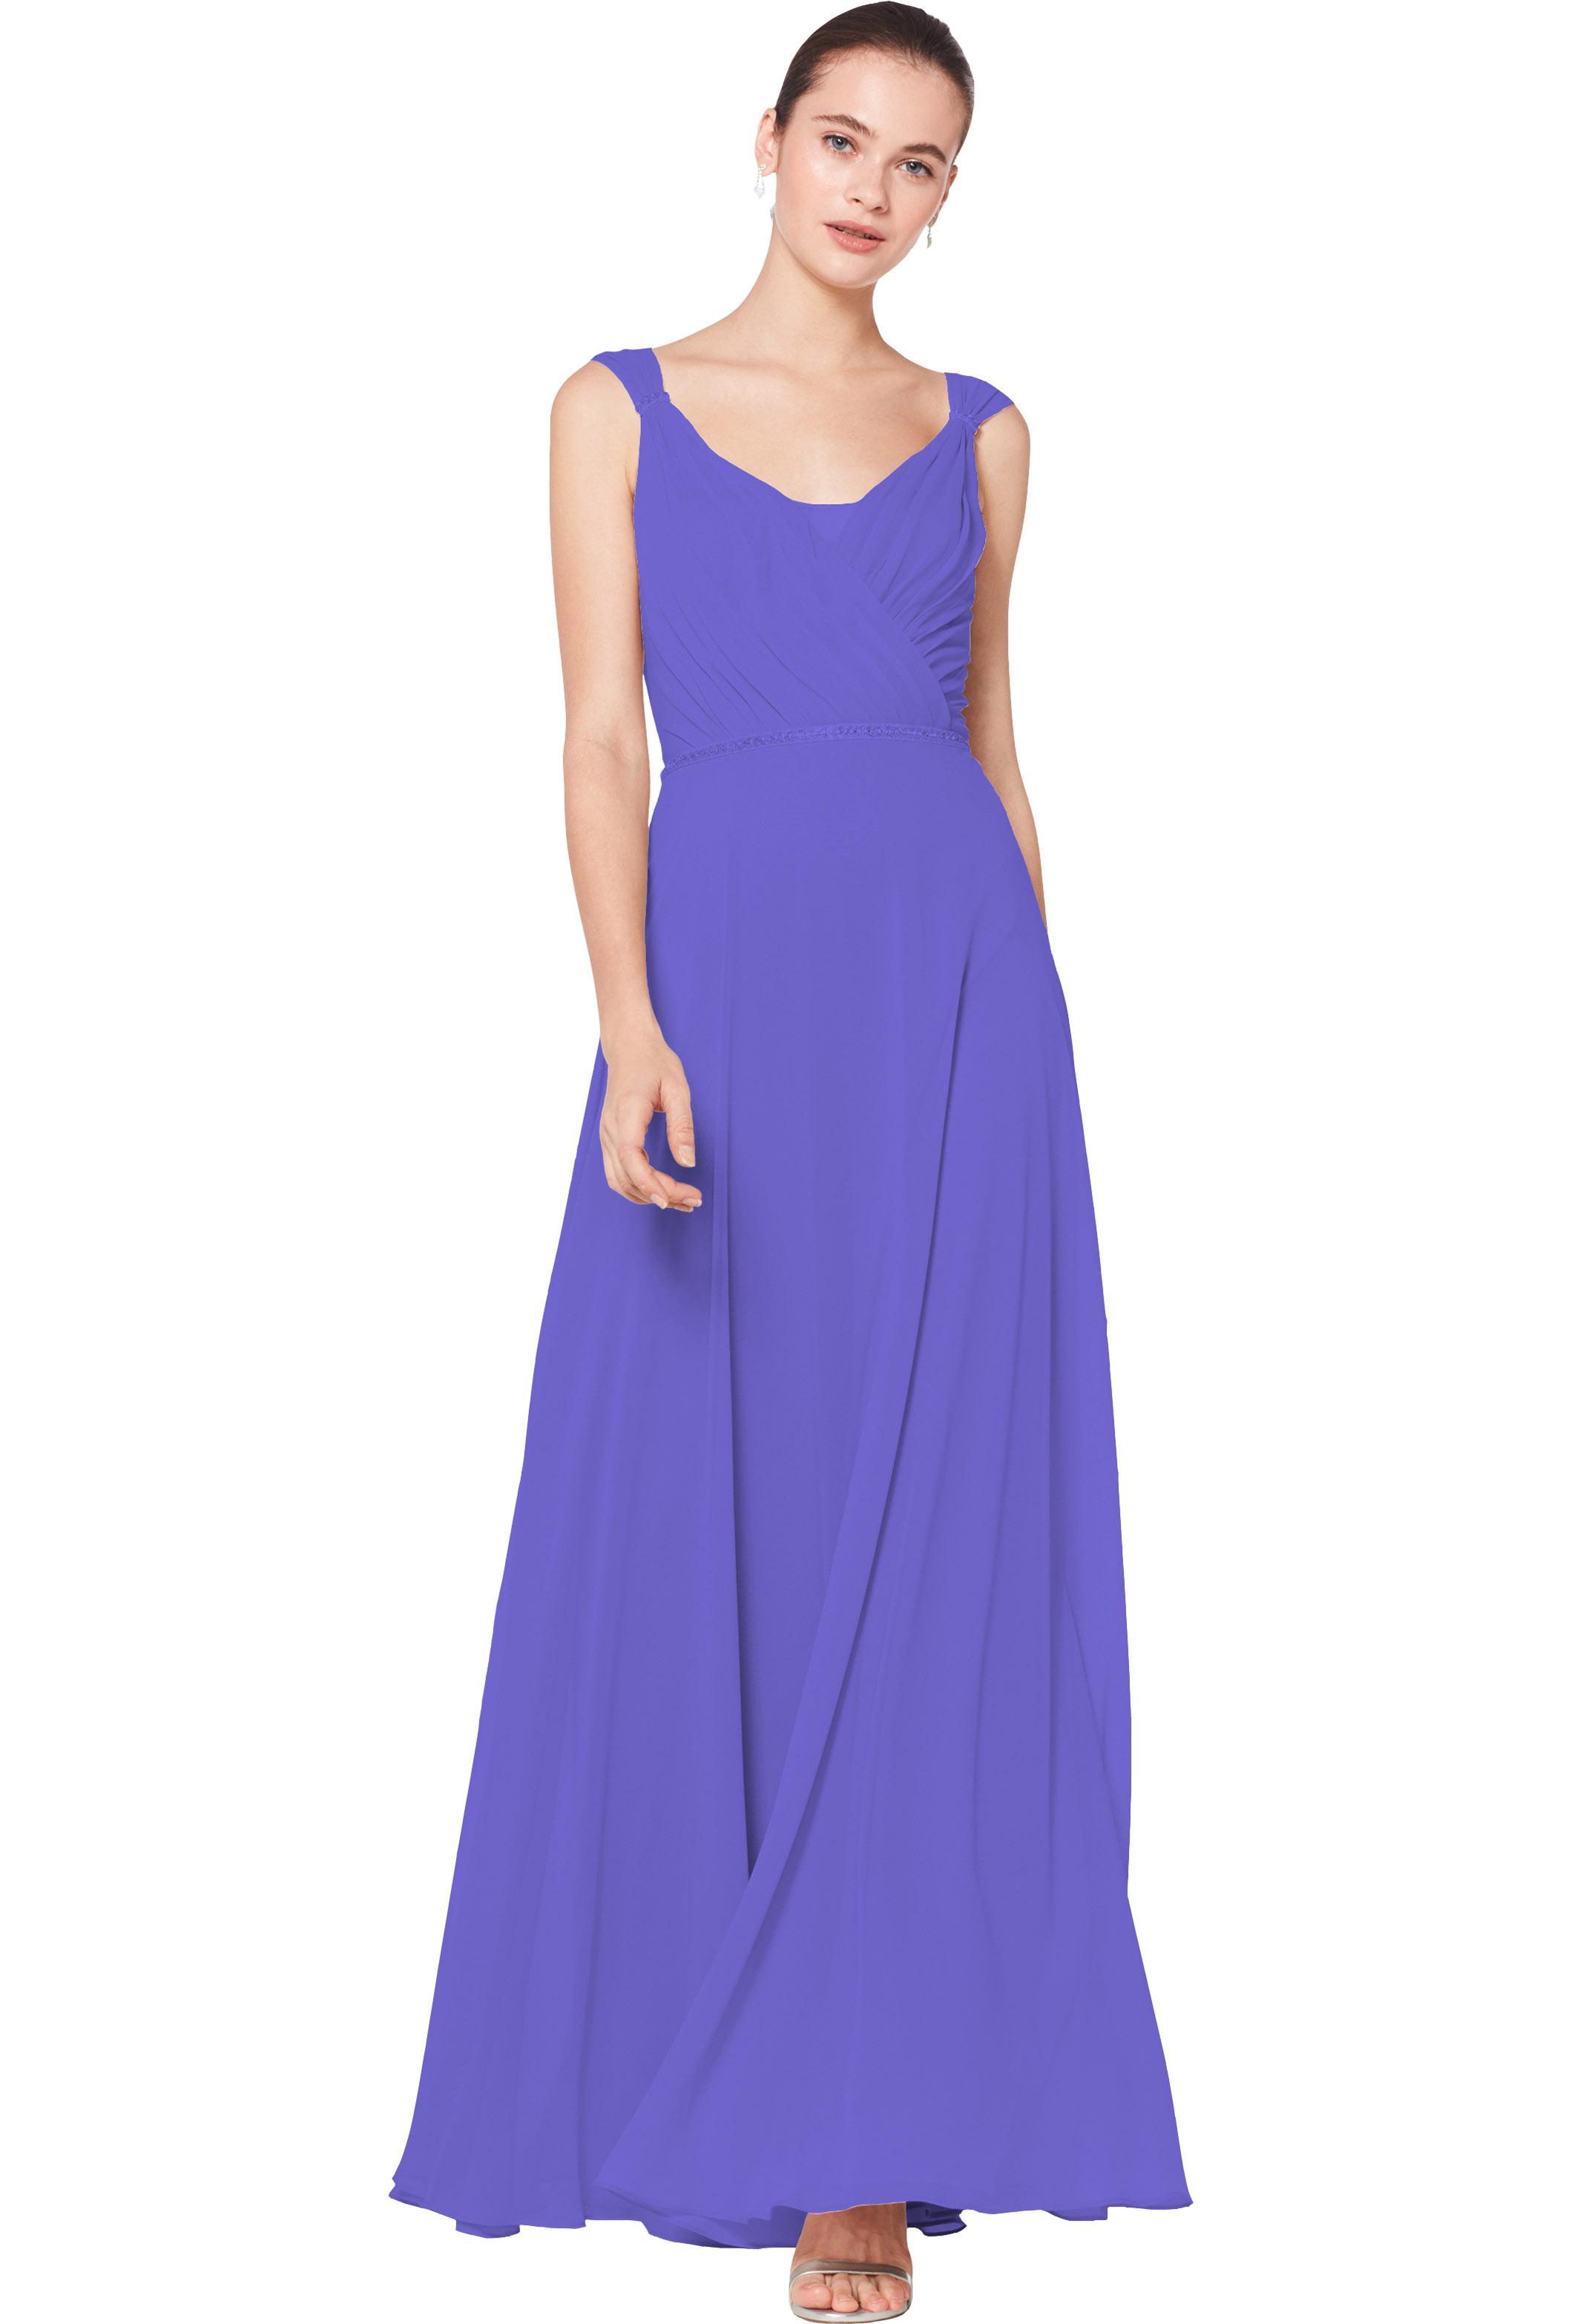 Bill Levkoff REGENCY Chiffon Sleeveless A-line gown, $230.00 Front